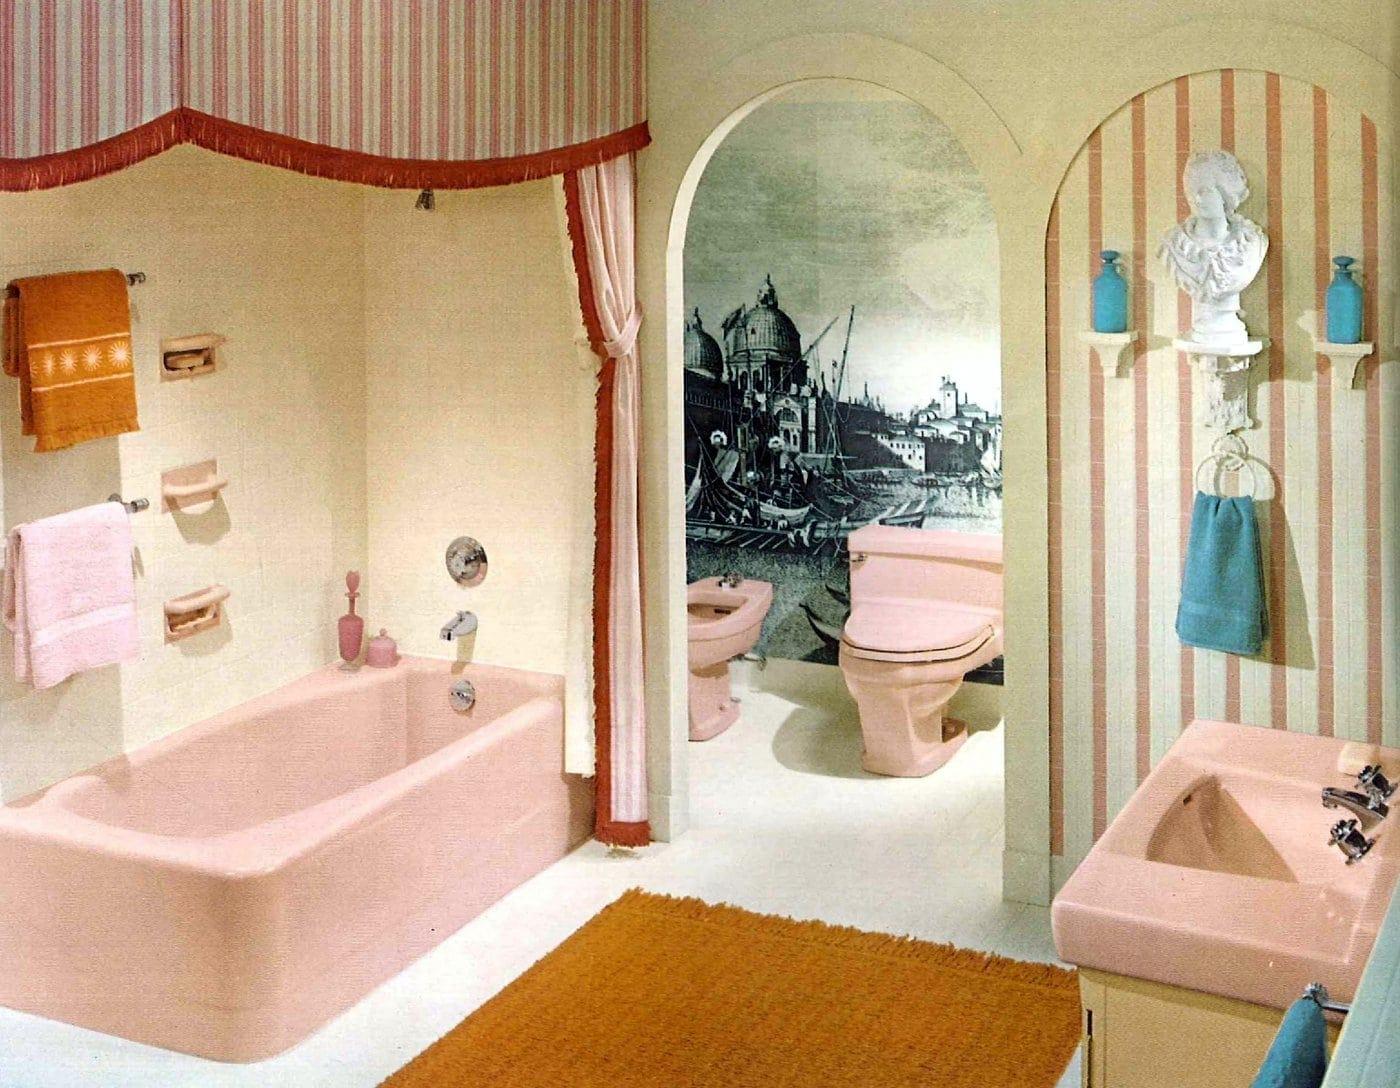 Vintage bathroom style ideas from 1962 (5)